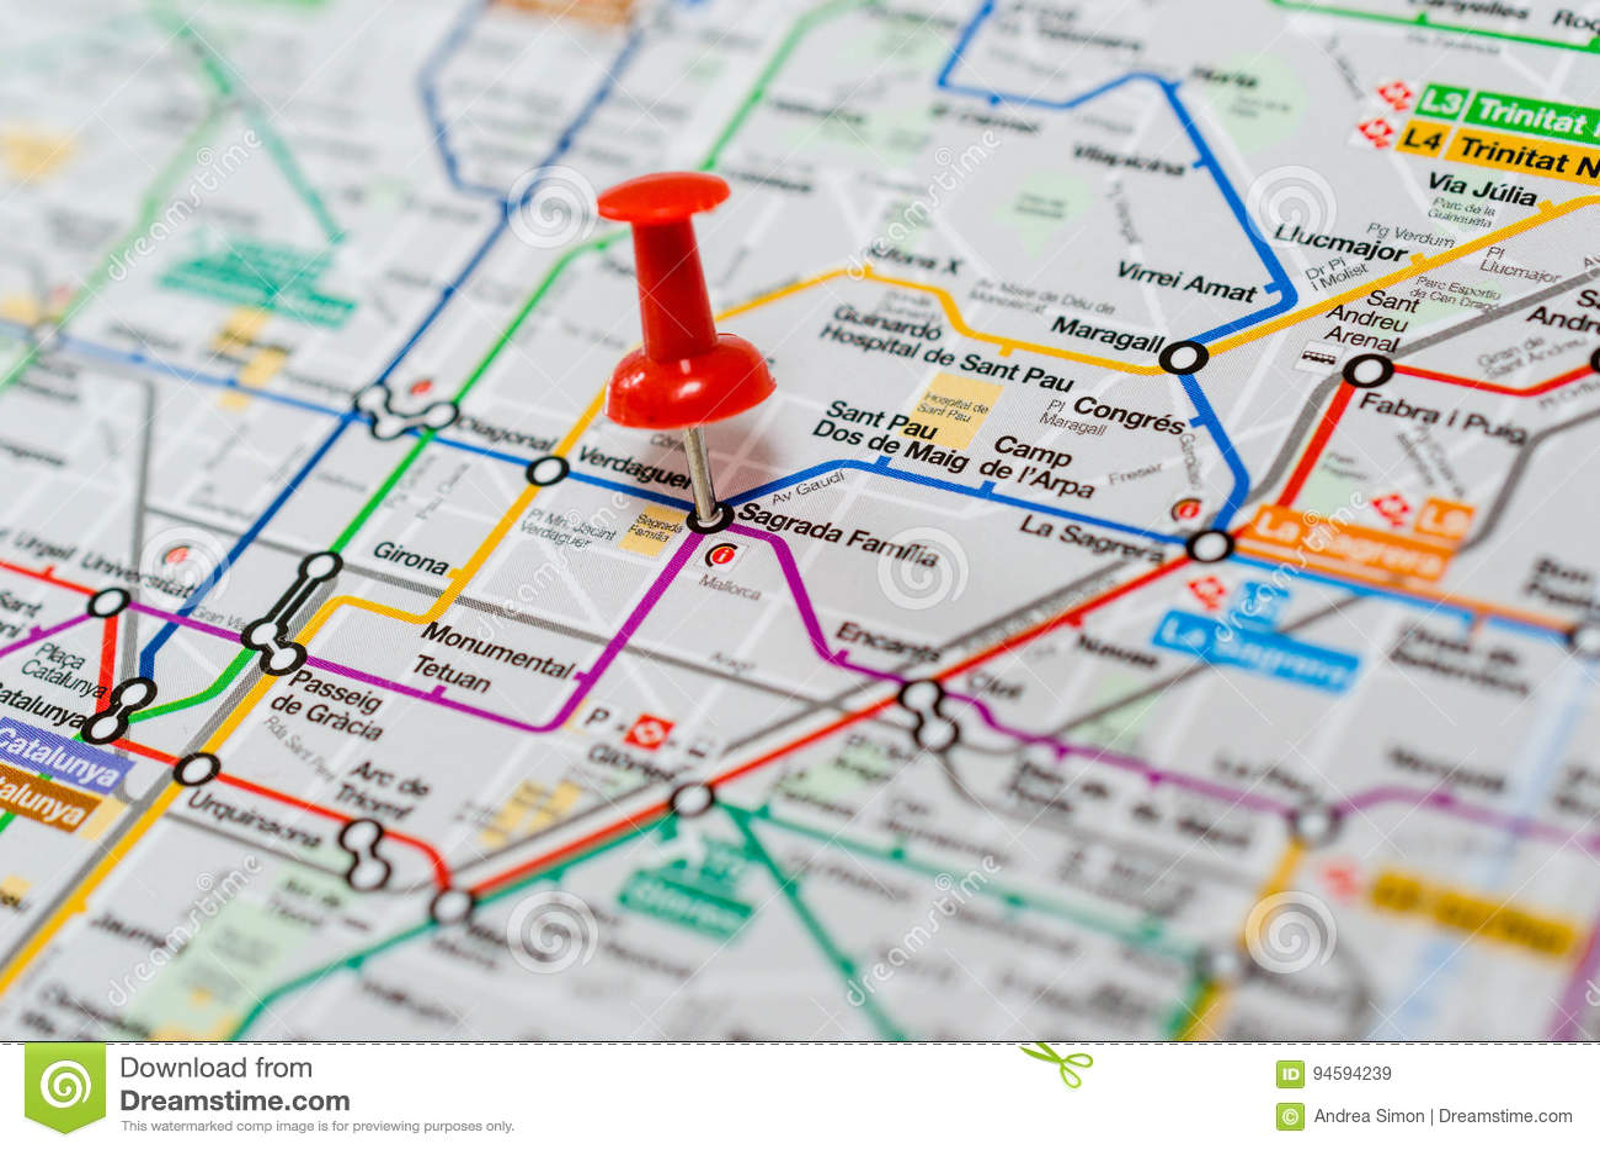 Subway Map Barcelona.Sagrada Familia On A Map Stock Image Image Of Discovery 94594239